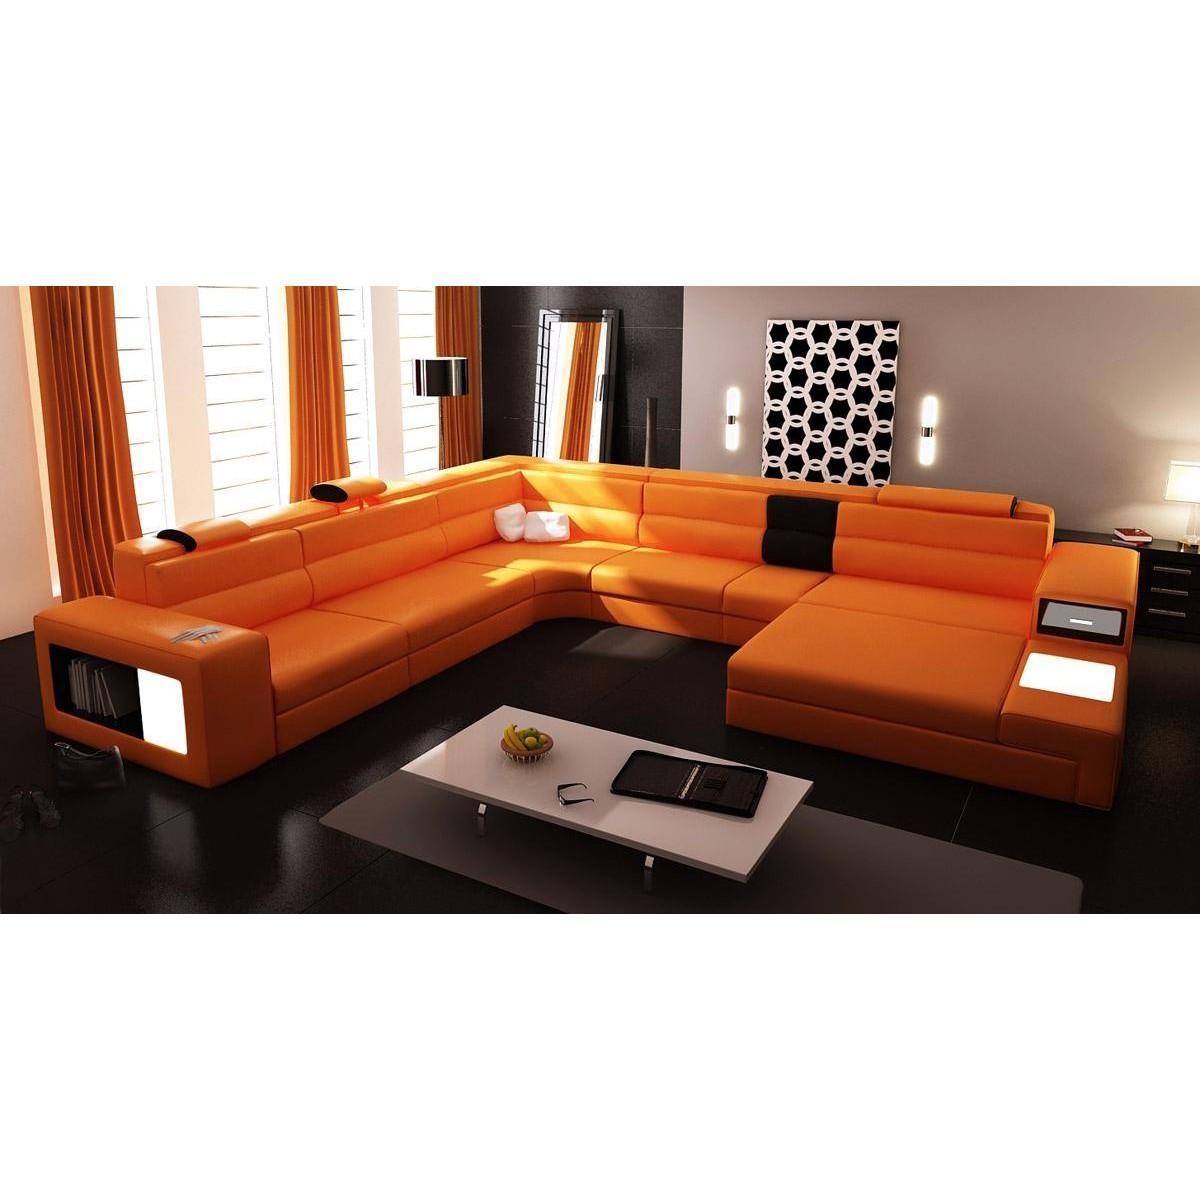 Contemporary & Luxury Furniture; Living Room, Bedroom,la Furniture Regarding Orange Sectional Sofa (View 16 of 20)